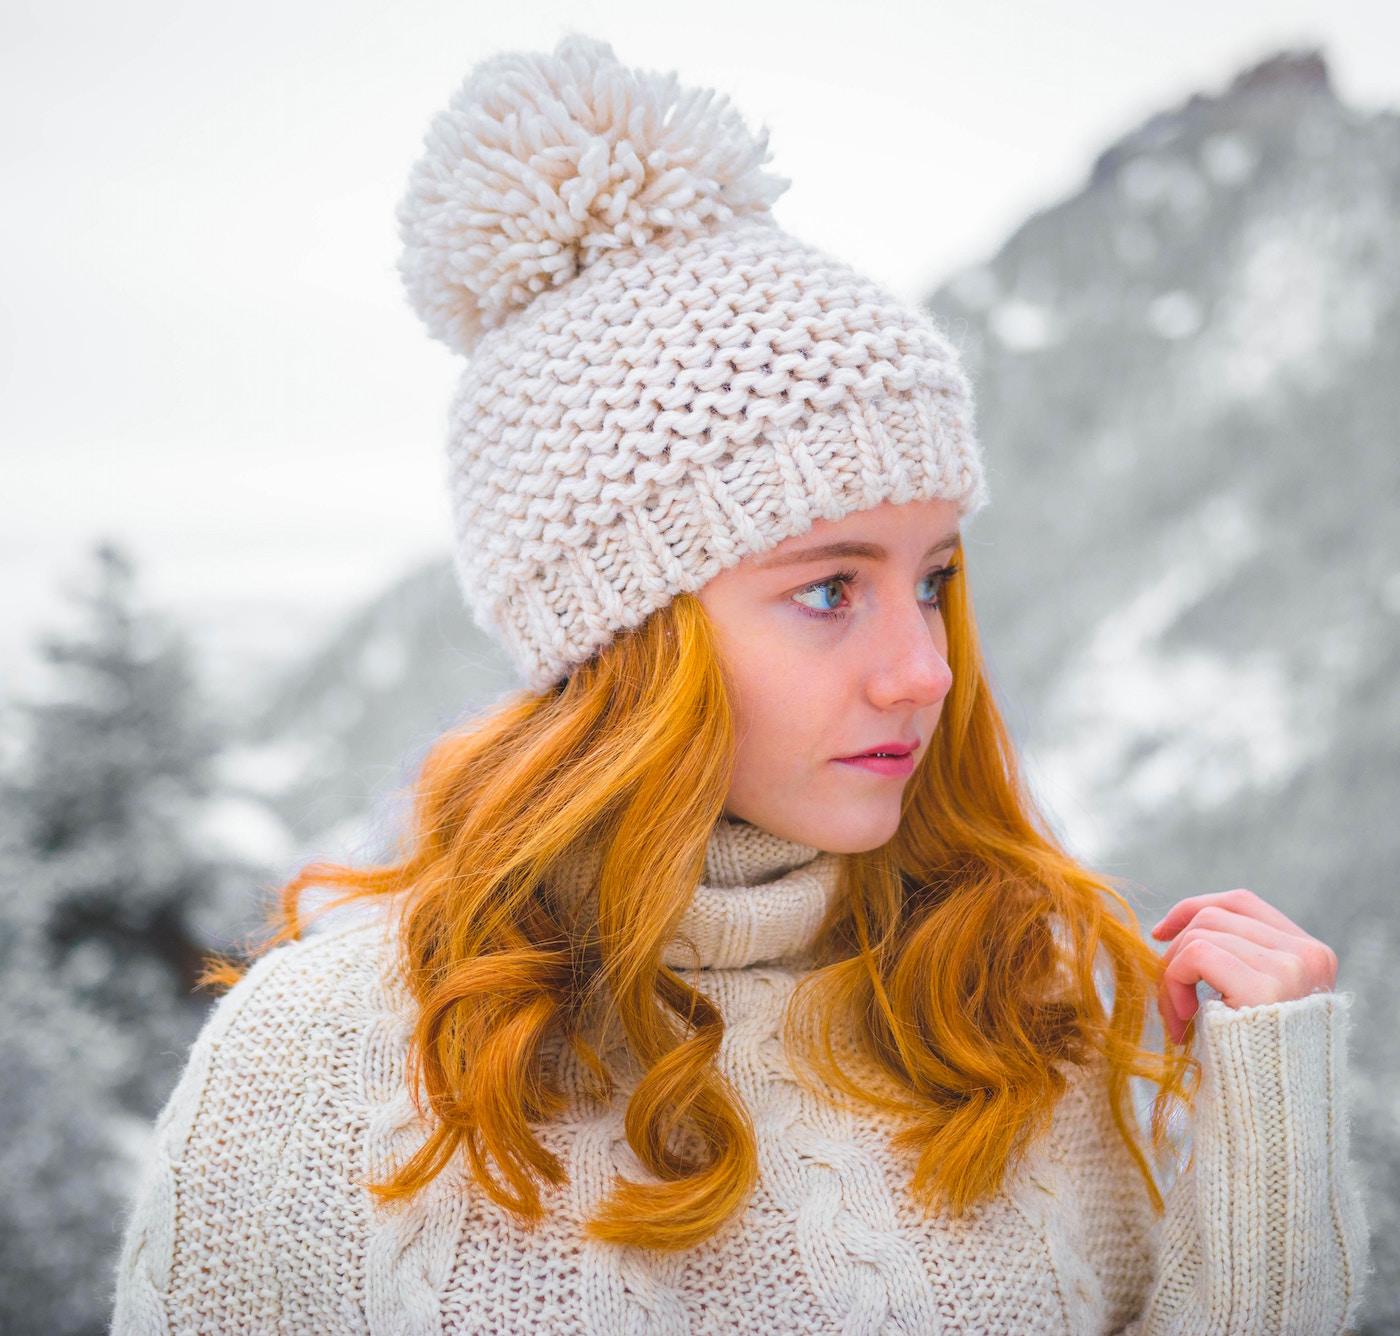 Dr.-Spiller-Sensicura-Intensive-Cream-abloomnova.net_ Why we need intense moisturising in winter